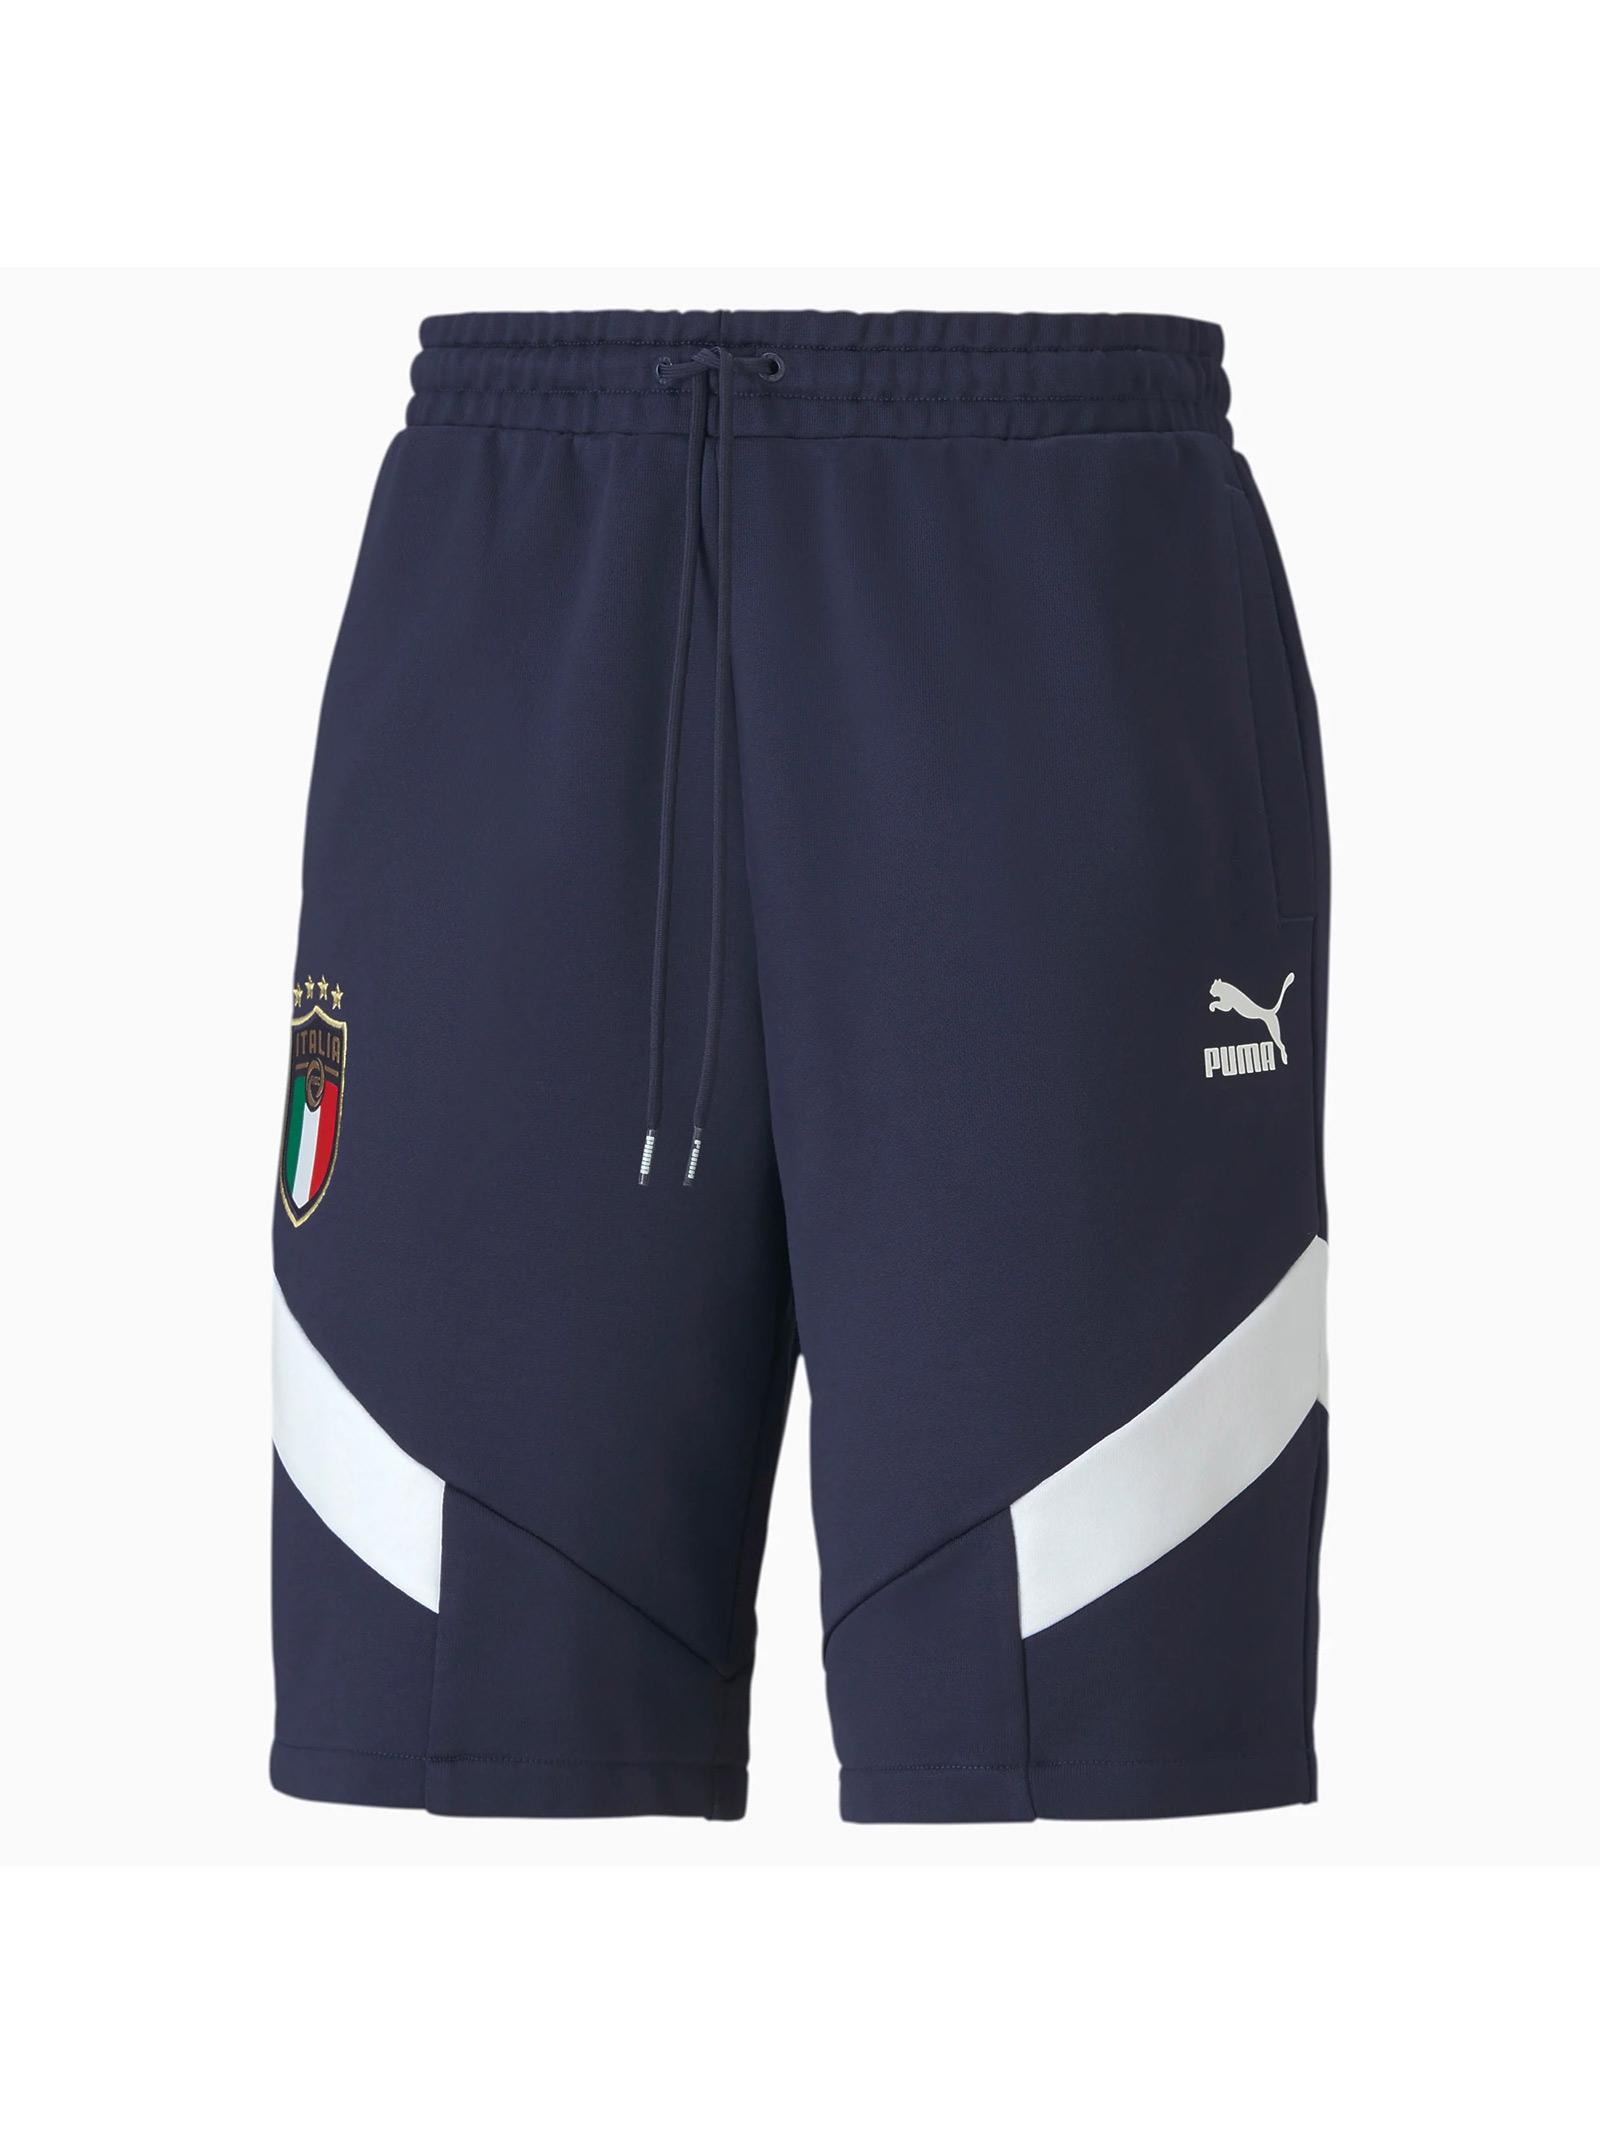 PUMA SHORT FIGC TEAM ICONIC PUMA | SHORT | 75666301